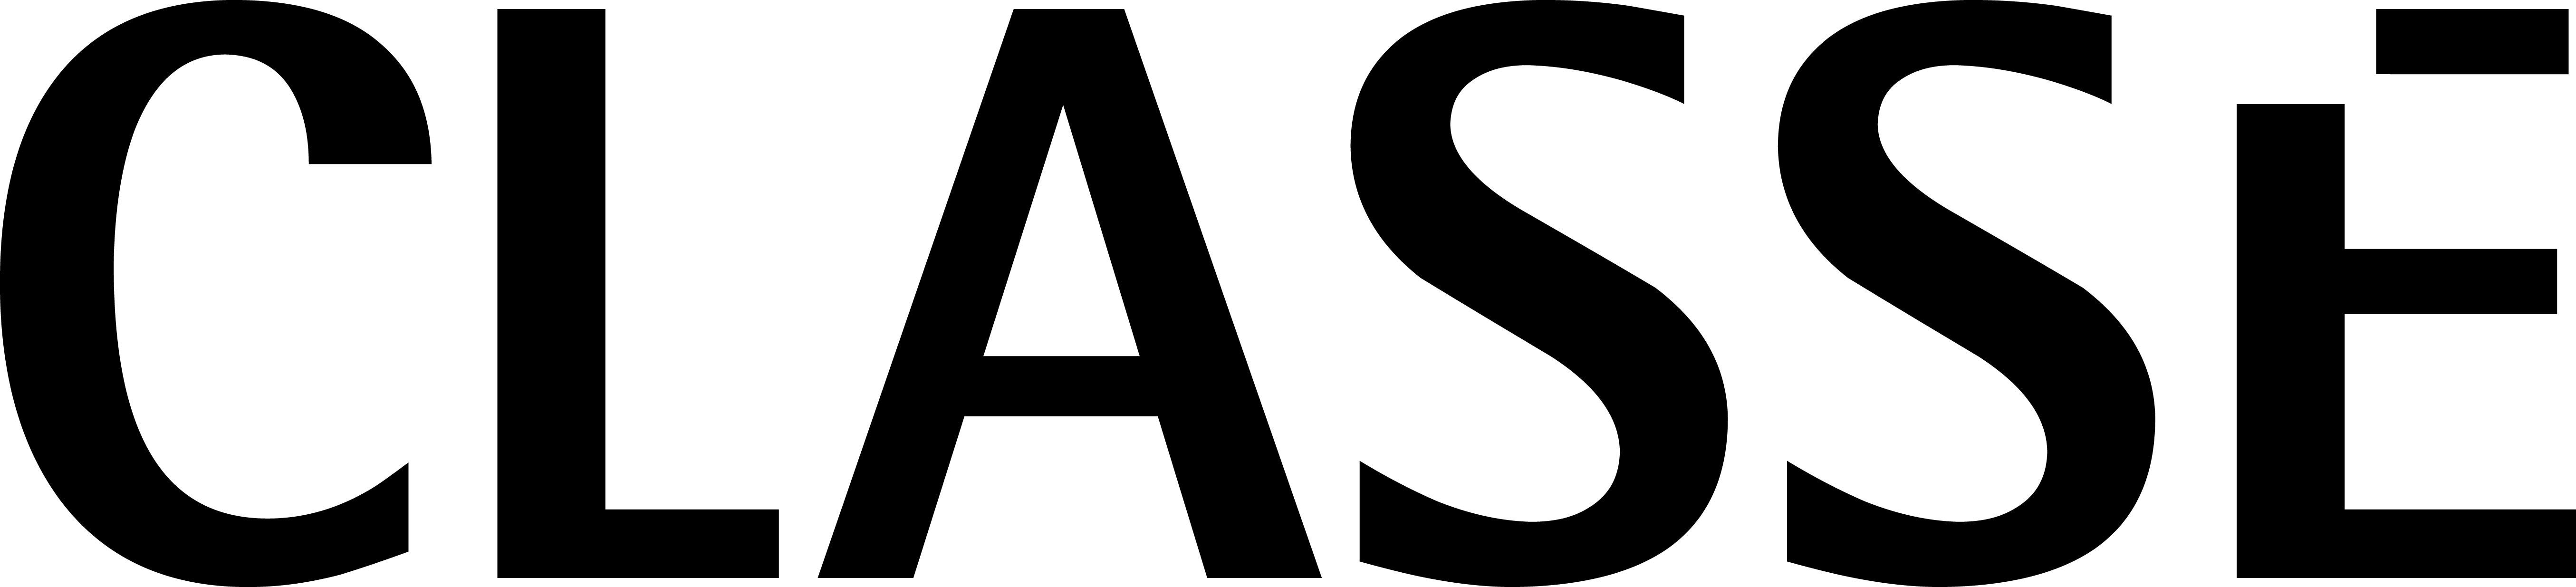 Classe NEW logo black